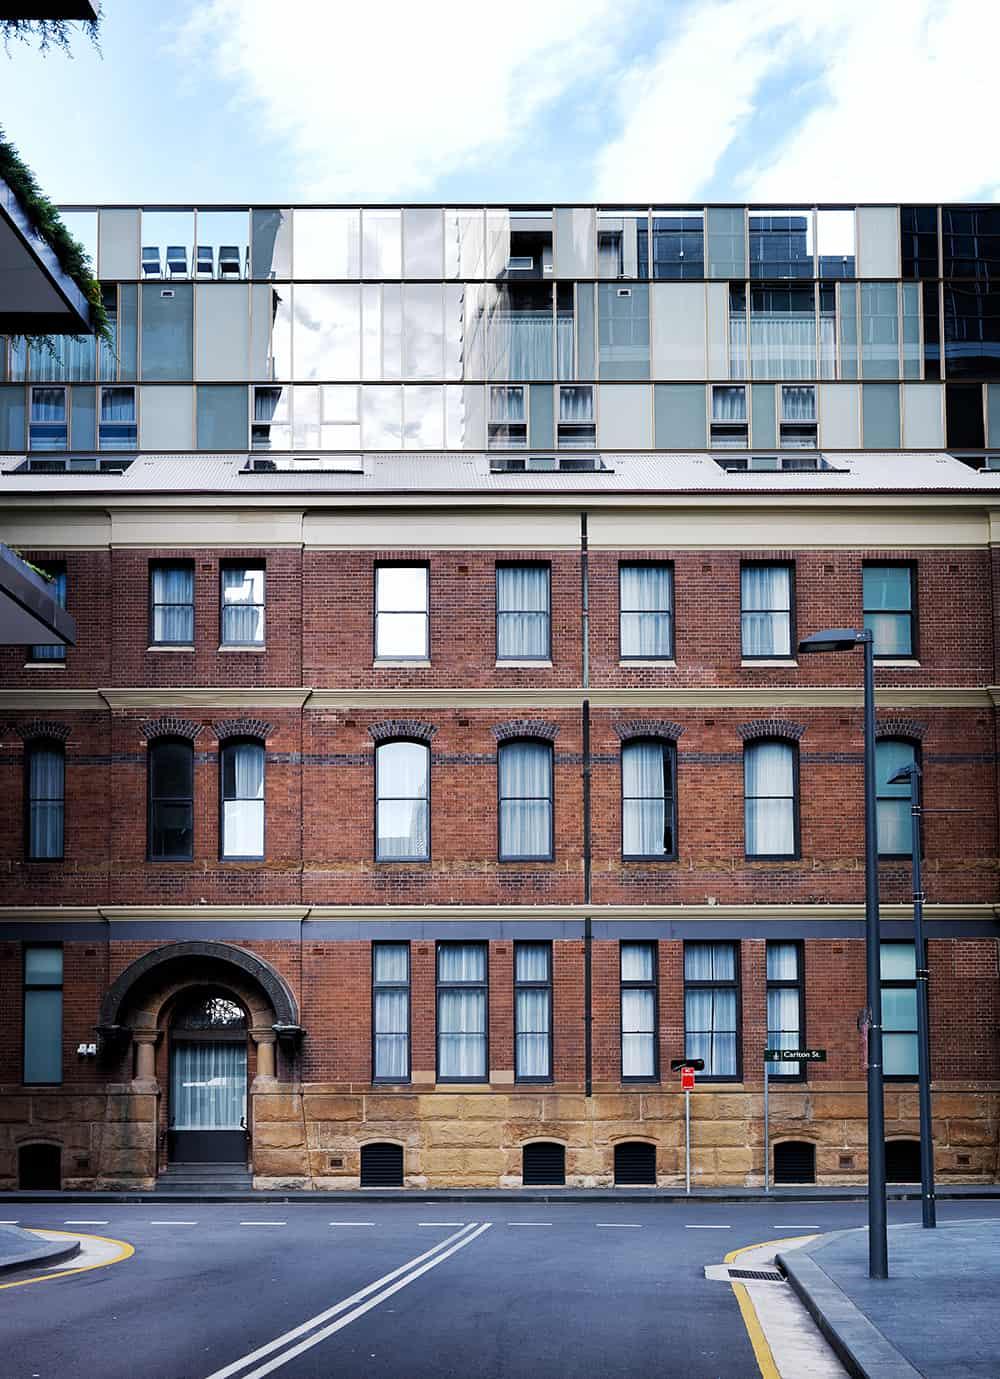 Hotel exteriors